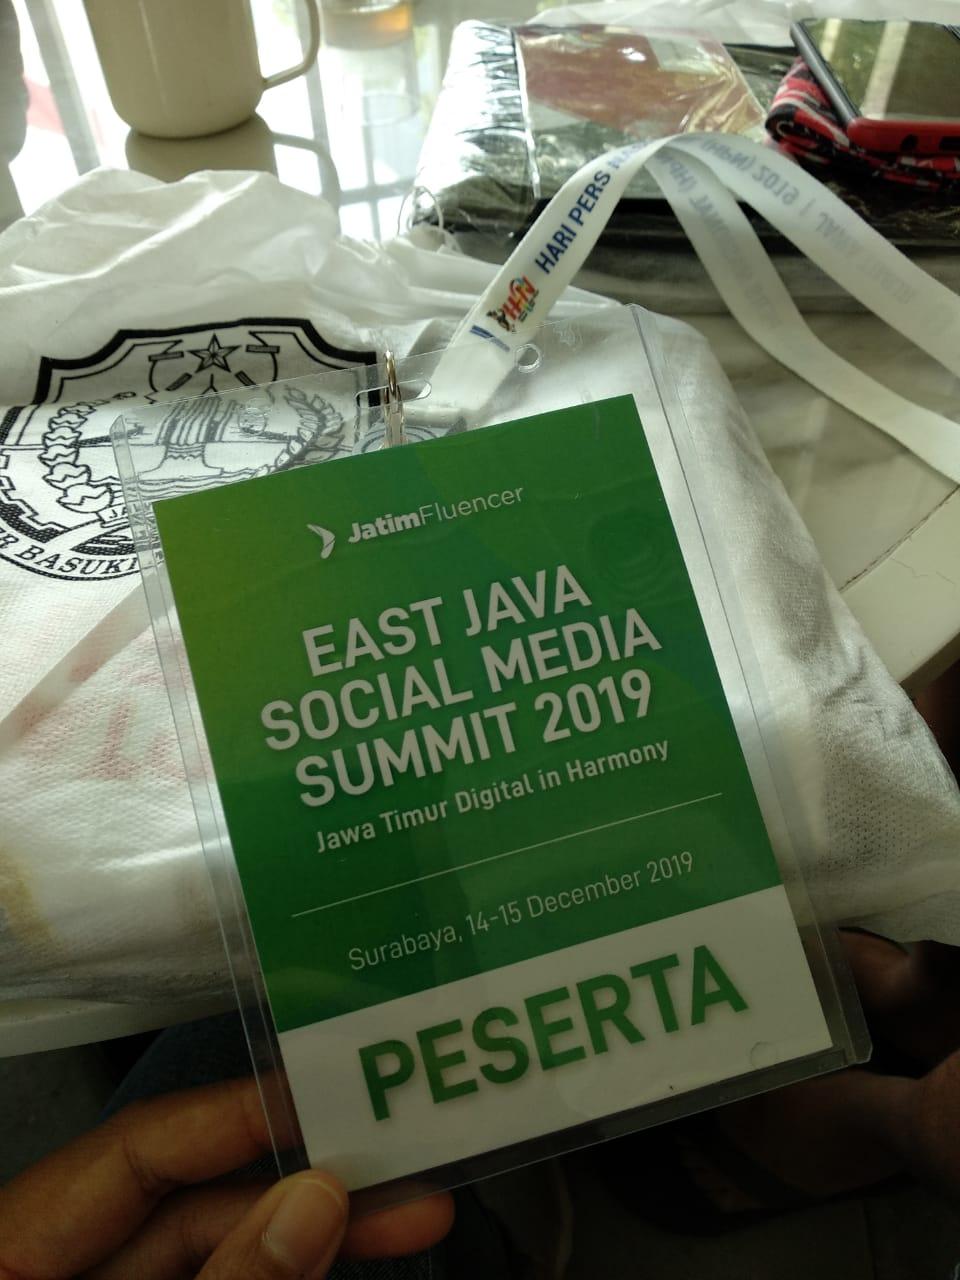 East Java Social Media Summit 2019. Dokumentasi pribadi Rizky Almira